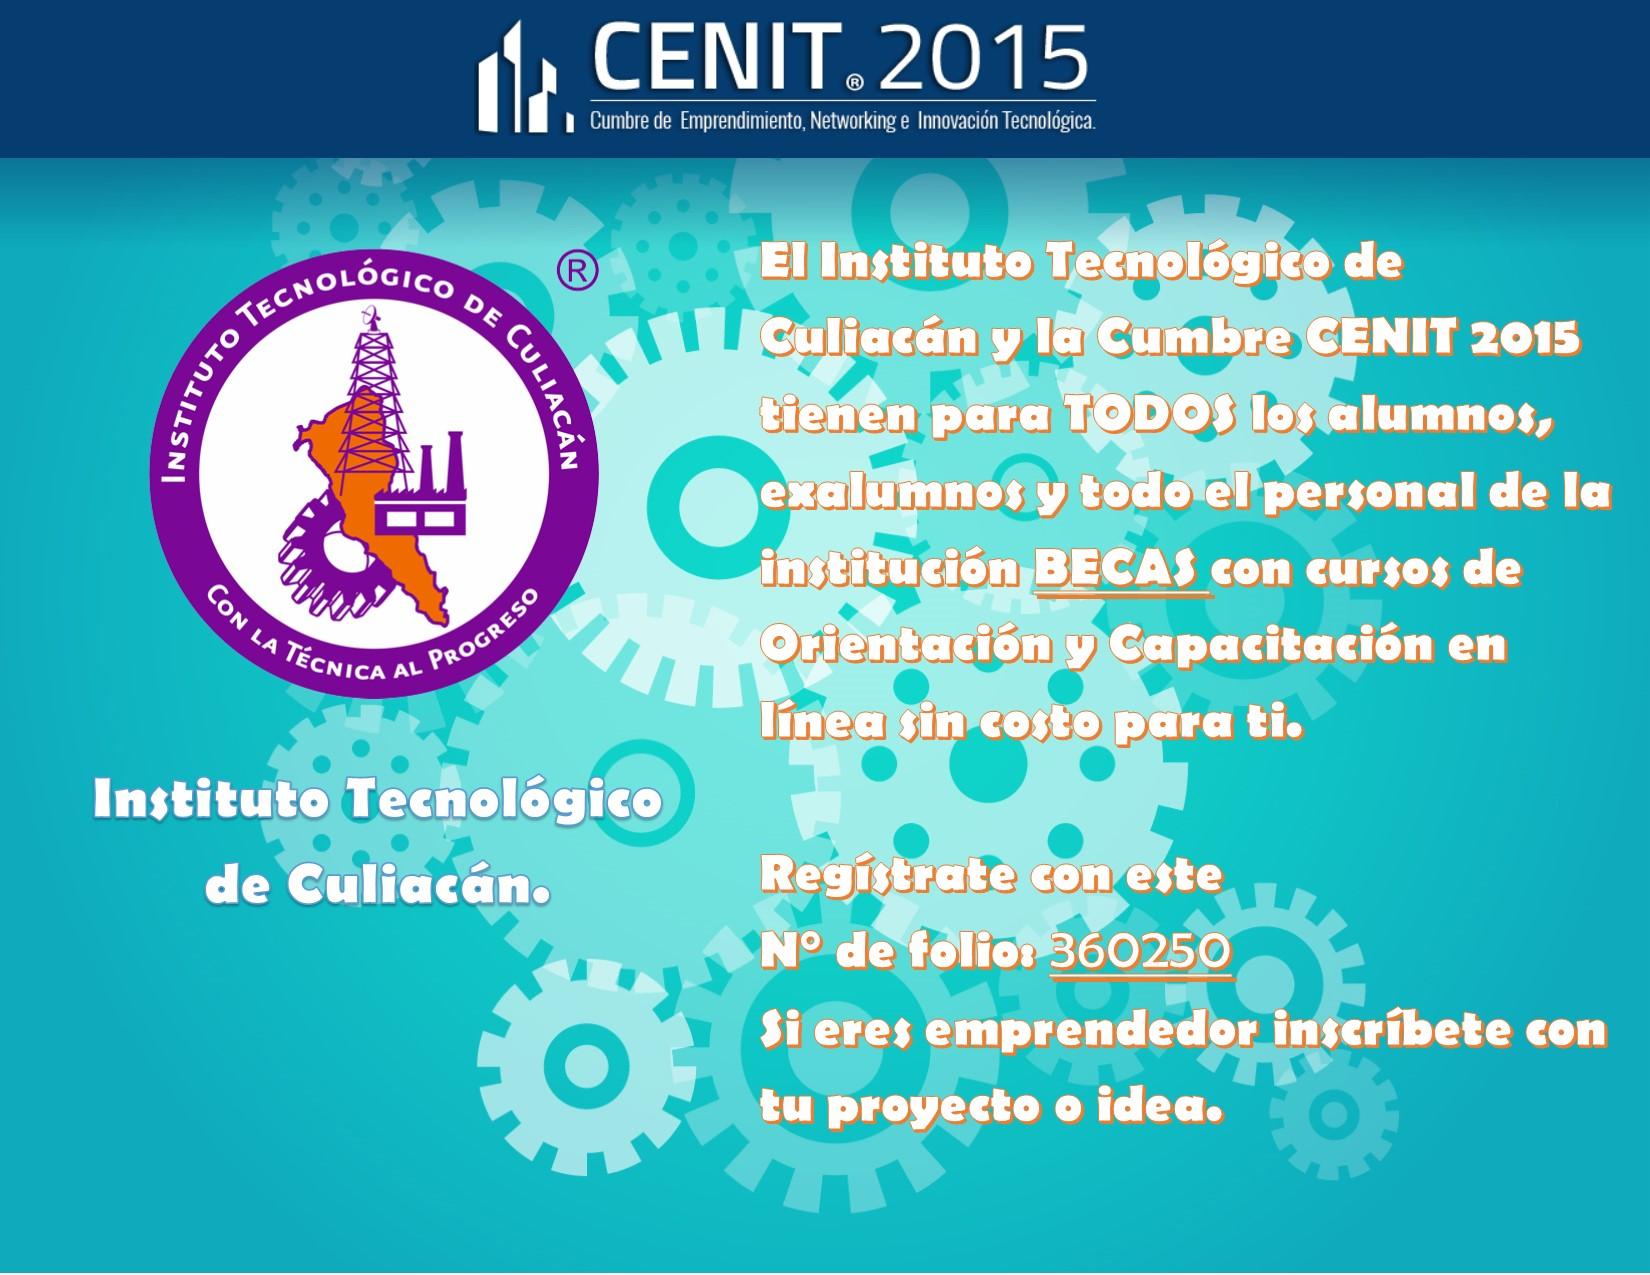 BECAS CENIT 2015 01